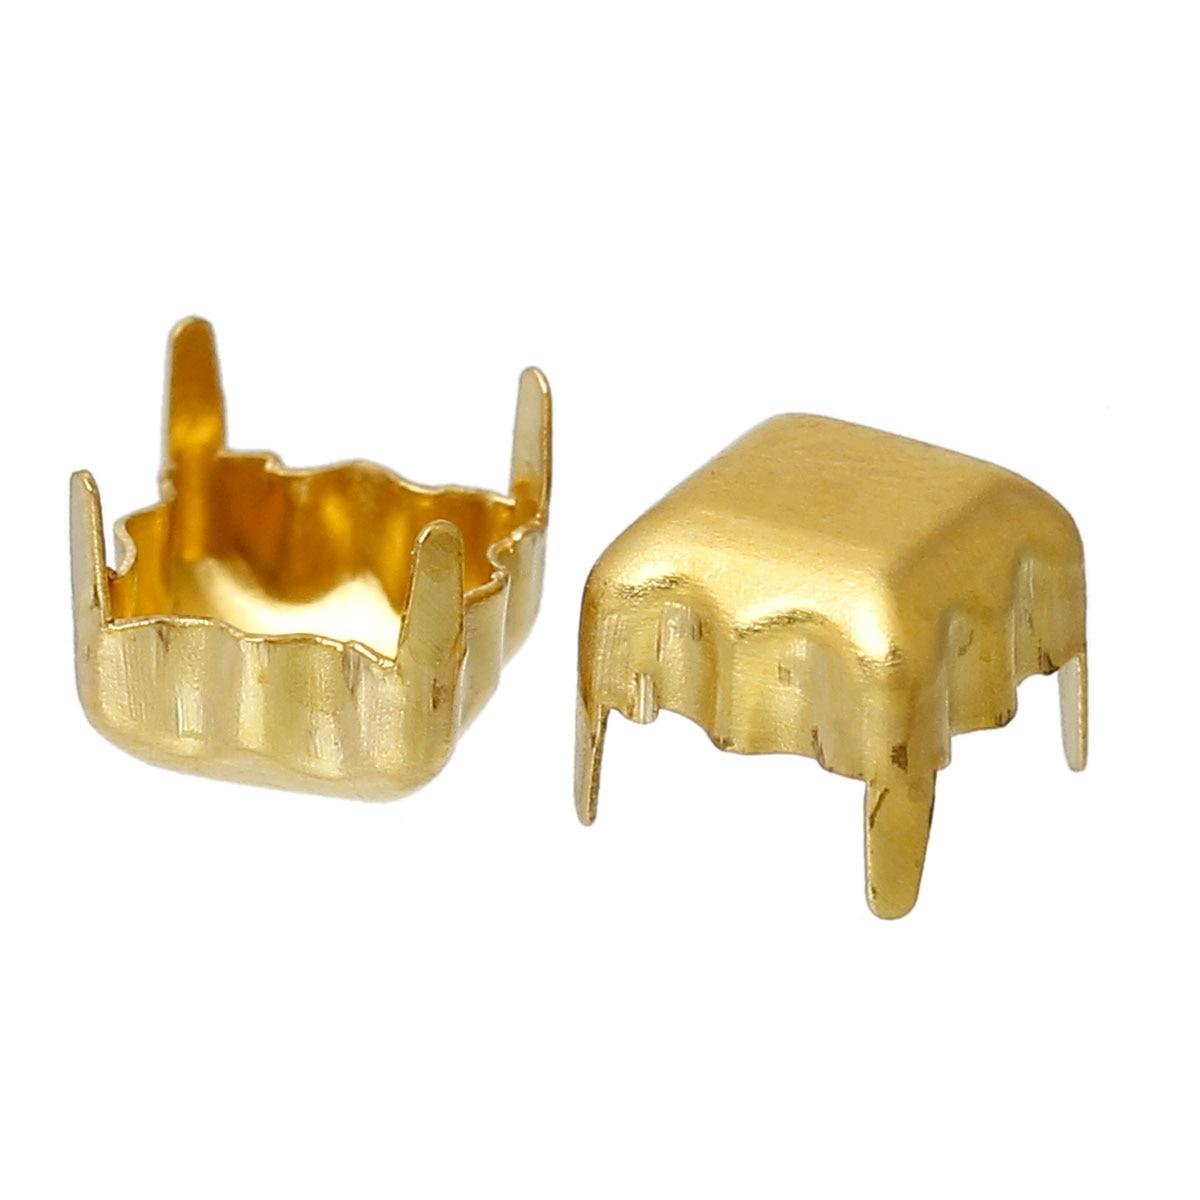 DoreenBeads Brass Cabochon Frame Settings Square Brass Tone Blank Cabochon Settings(Fits 5mm x 5mm)5mm(2/8)x 5mm(2/8),500 PCs